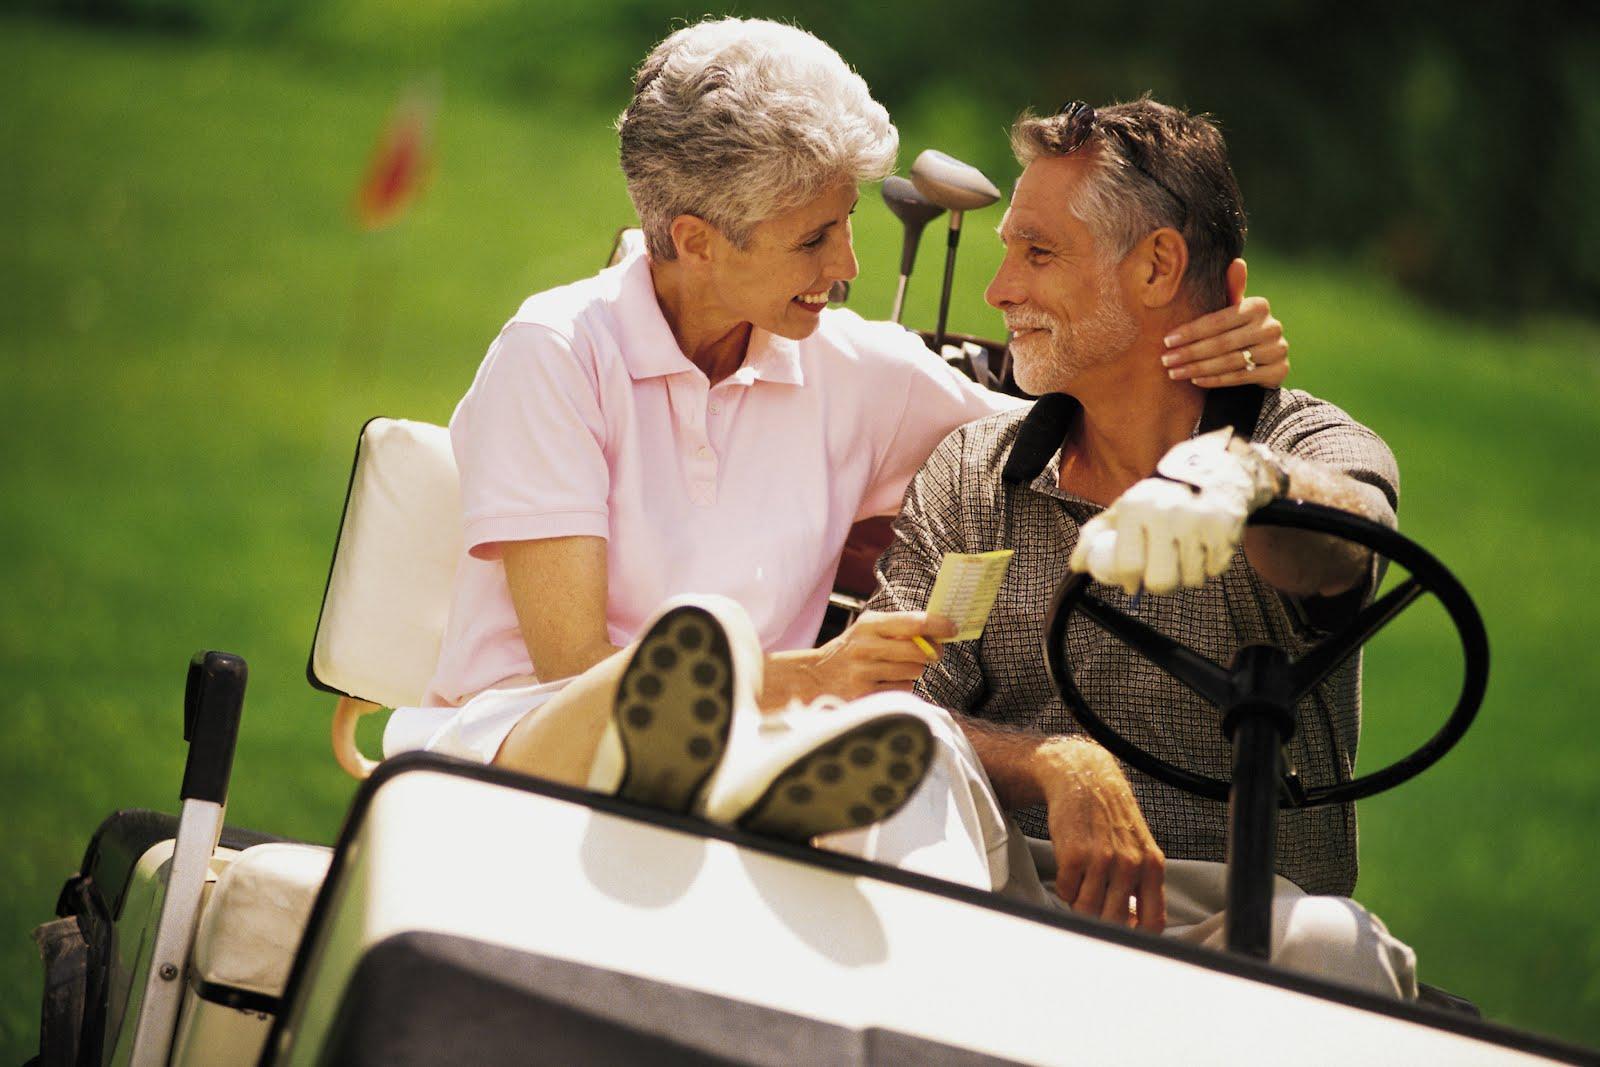 Vancouver International Mature Online Dating Service